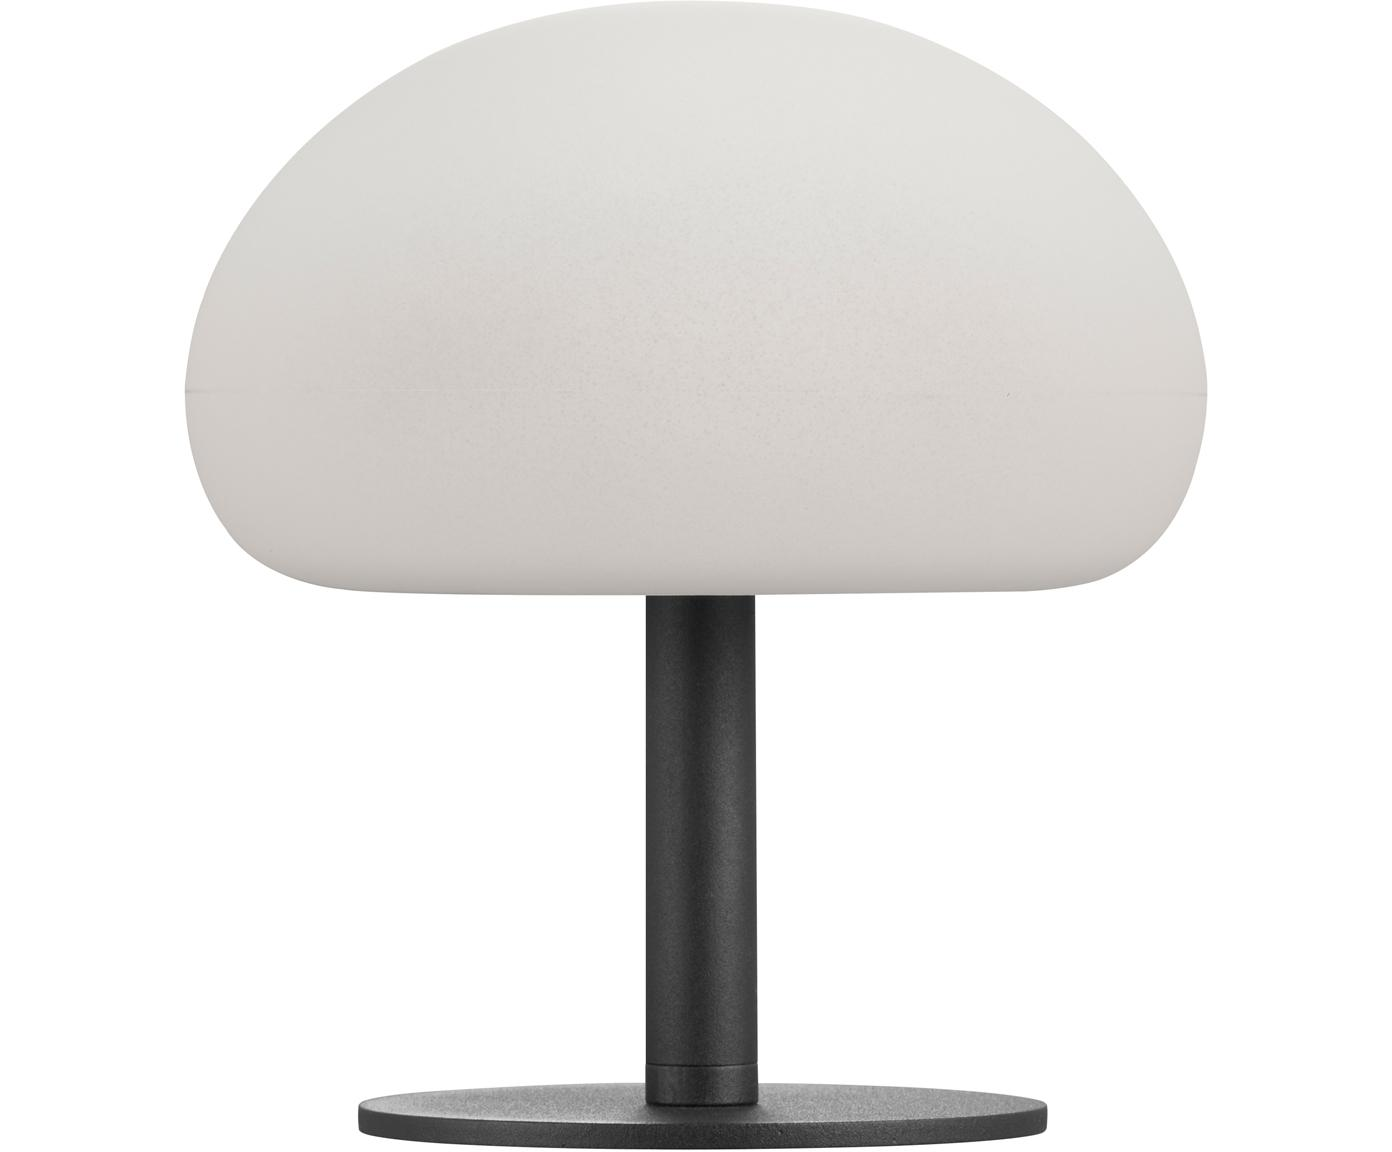 Lámpara de mesa LED regulable para exteriores Sponge, Pantalla: plástico (PVC), Blanco, negro, Ø 20 x Al 22 cm